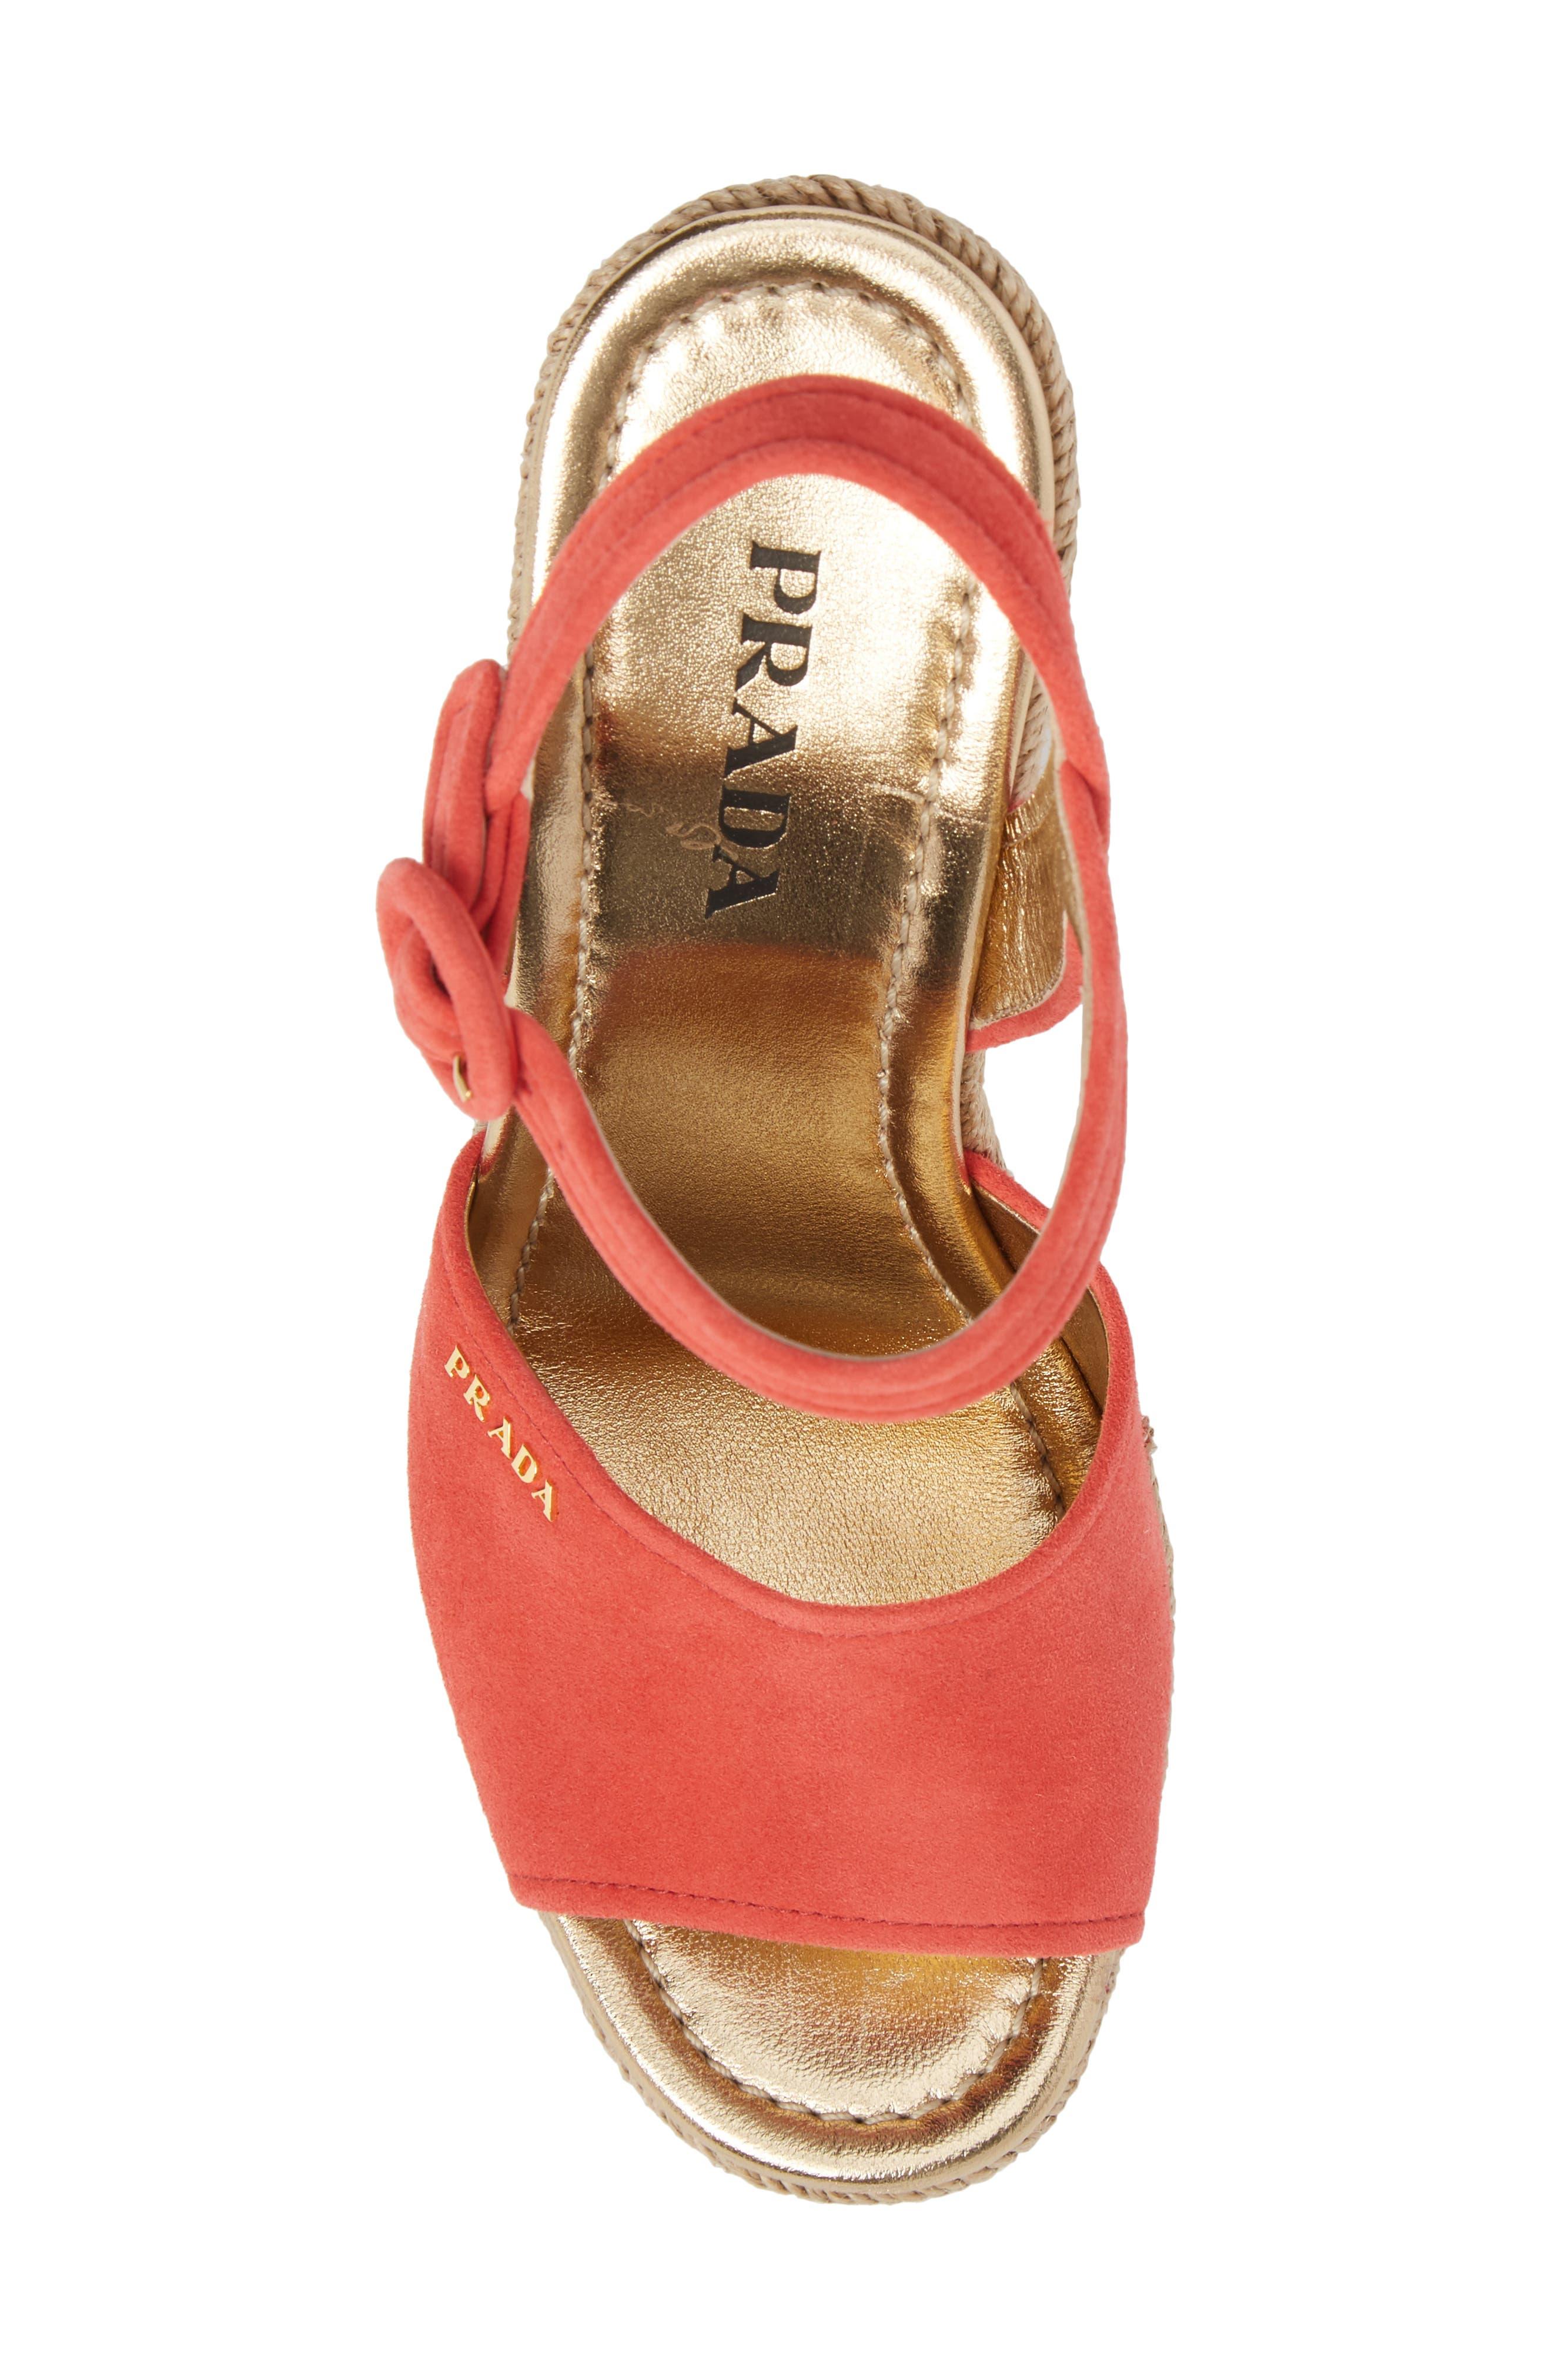 Espadrille Wedge Sandal,                             Alternate thumbnail 5, color,                             Red